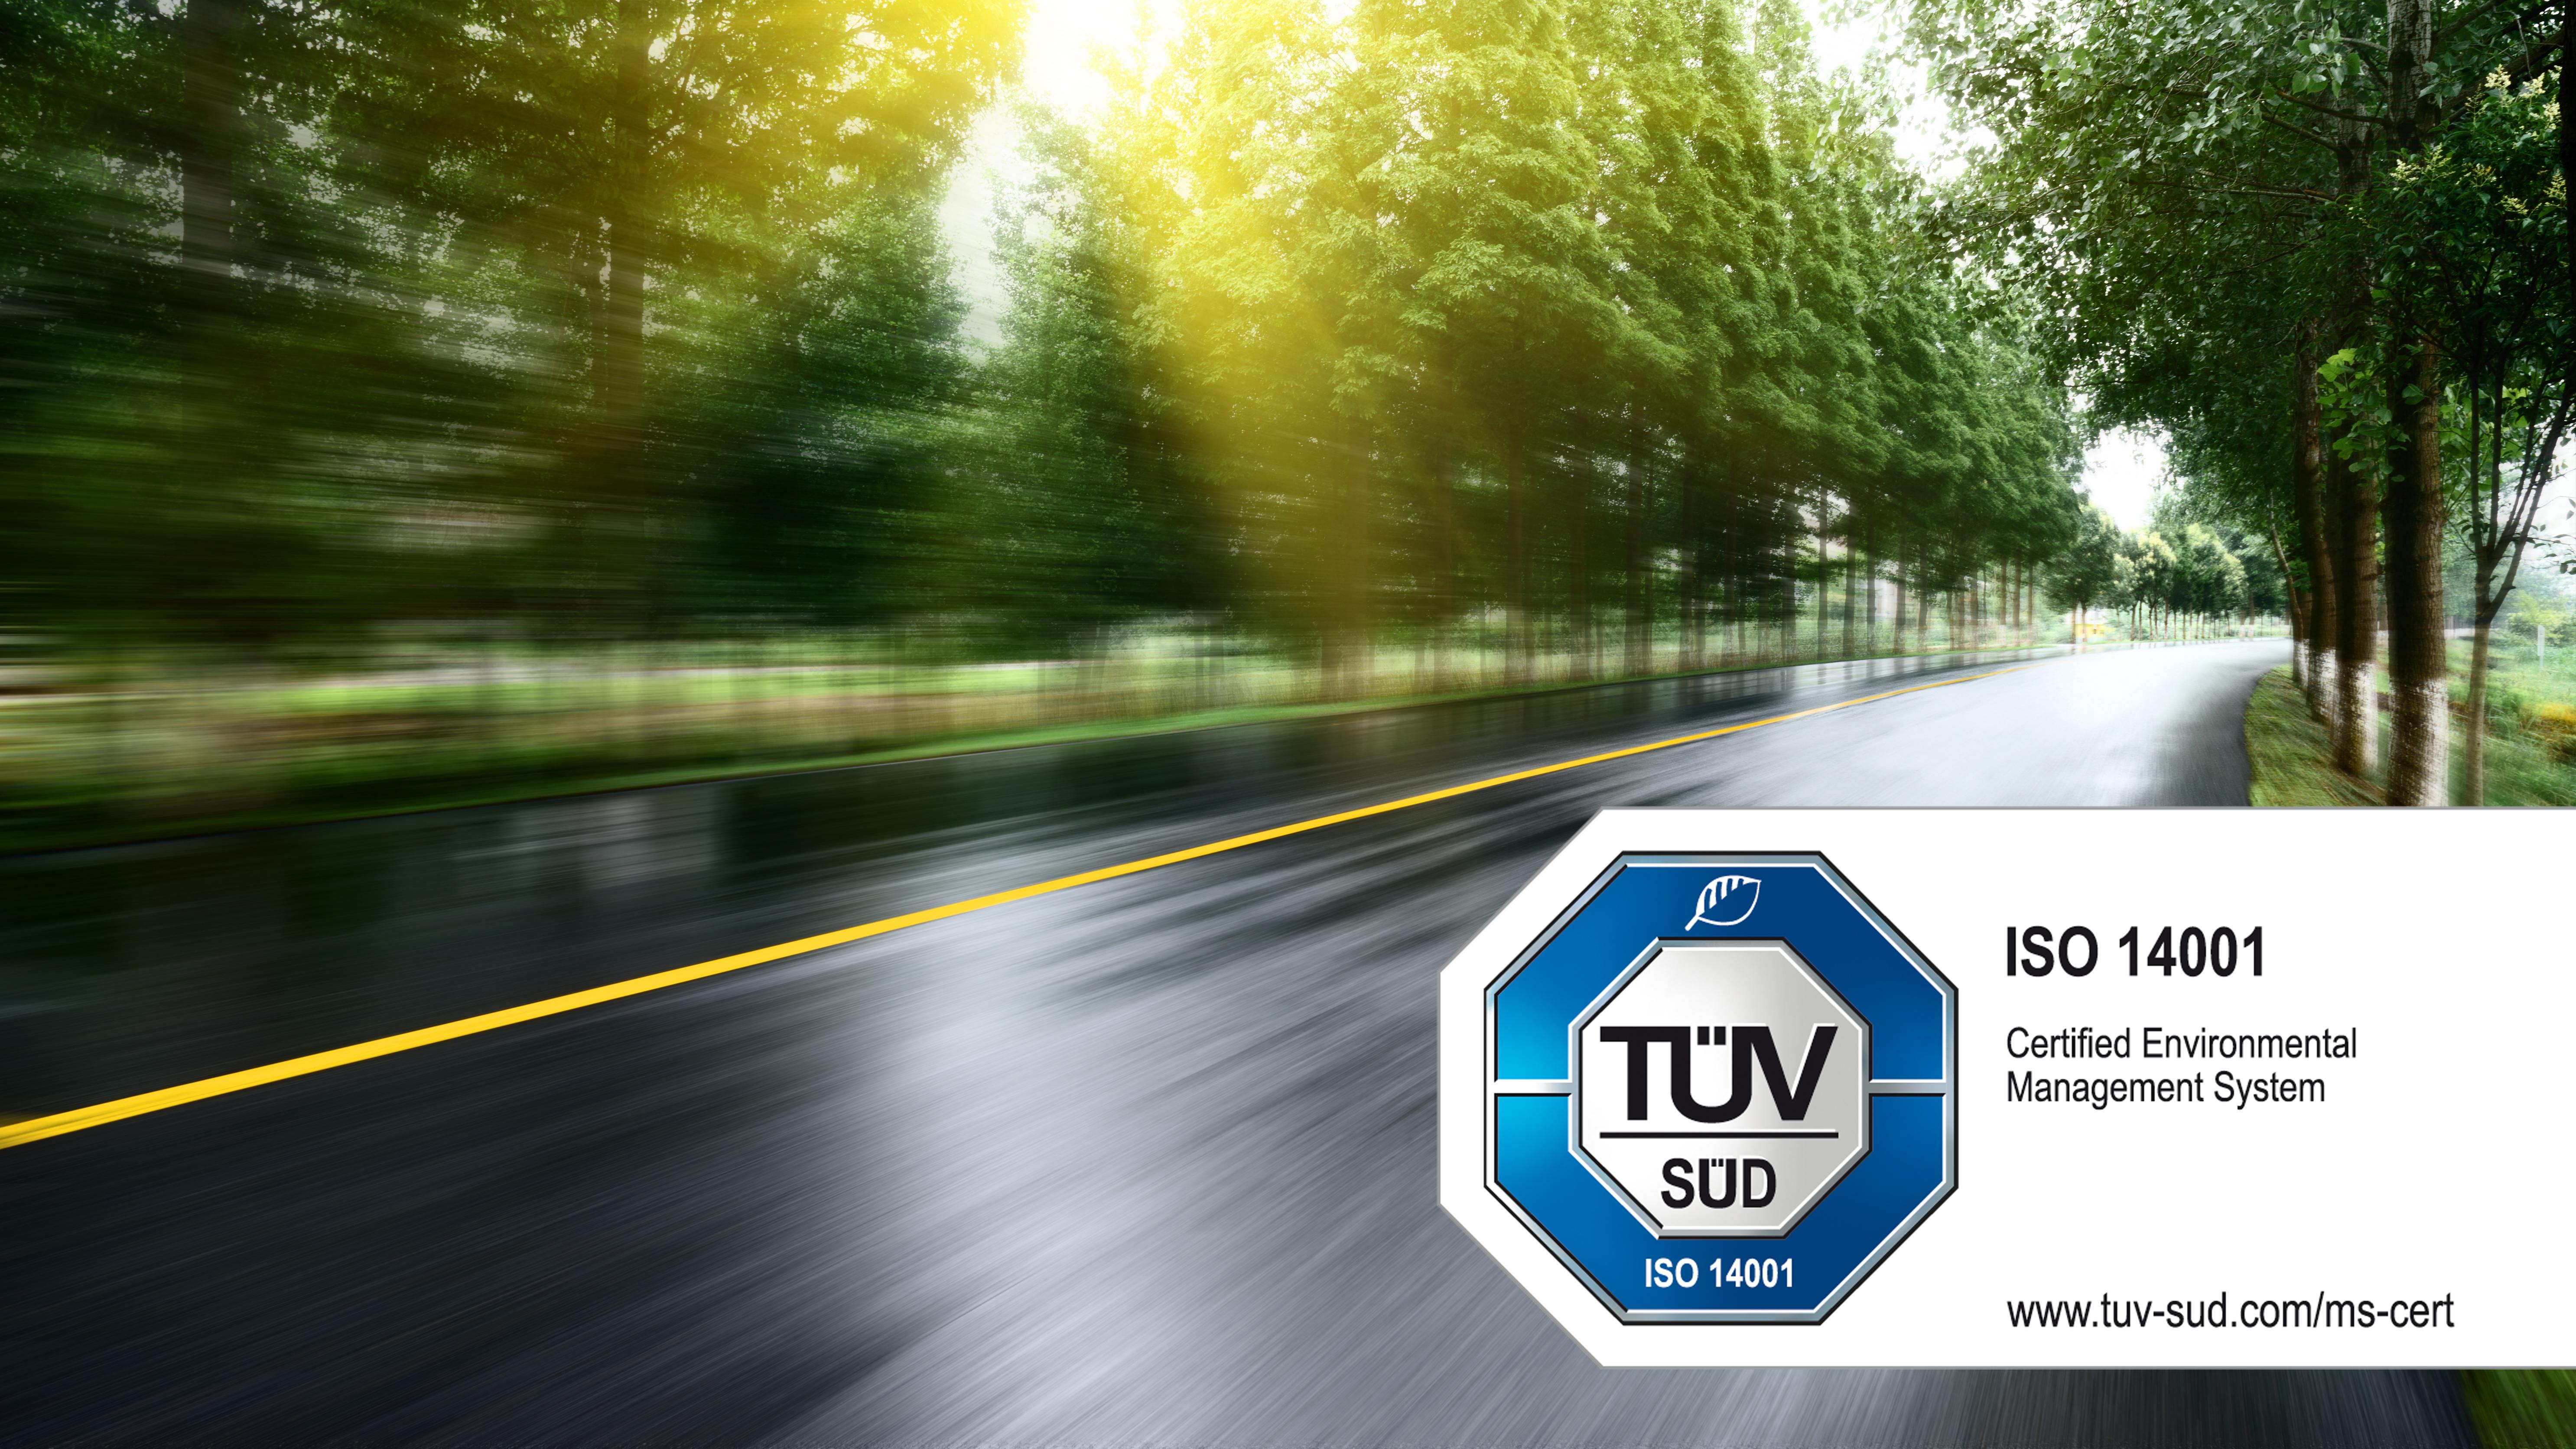 Webfleet Solutions uzyskuje certyfikat ISO 14001:2015